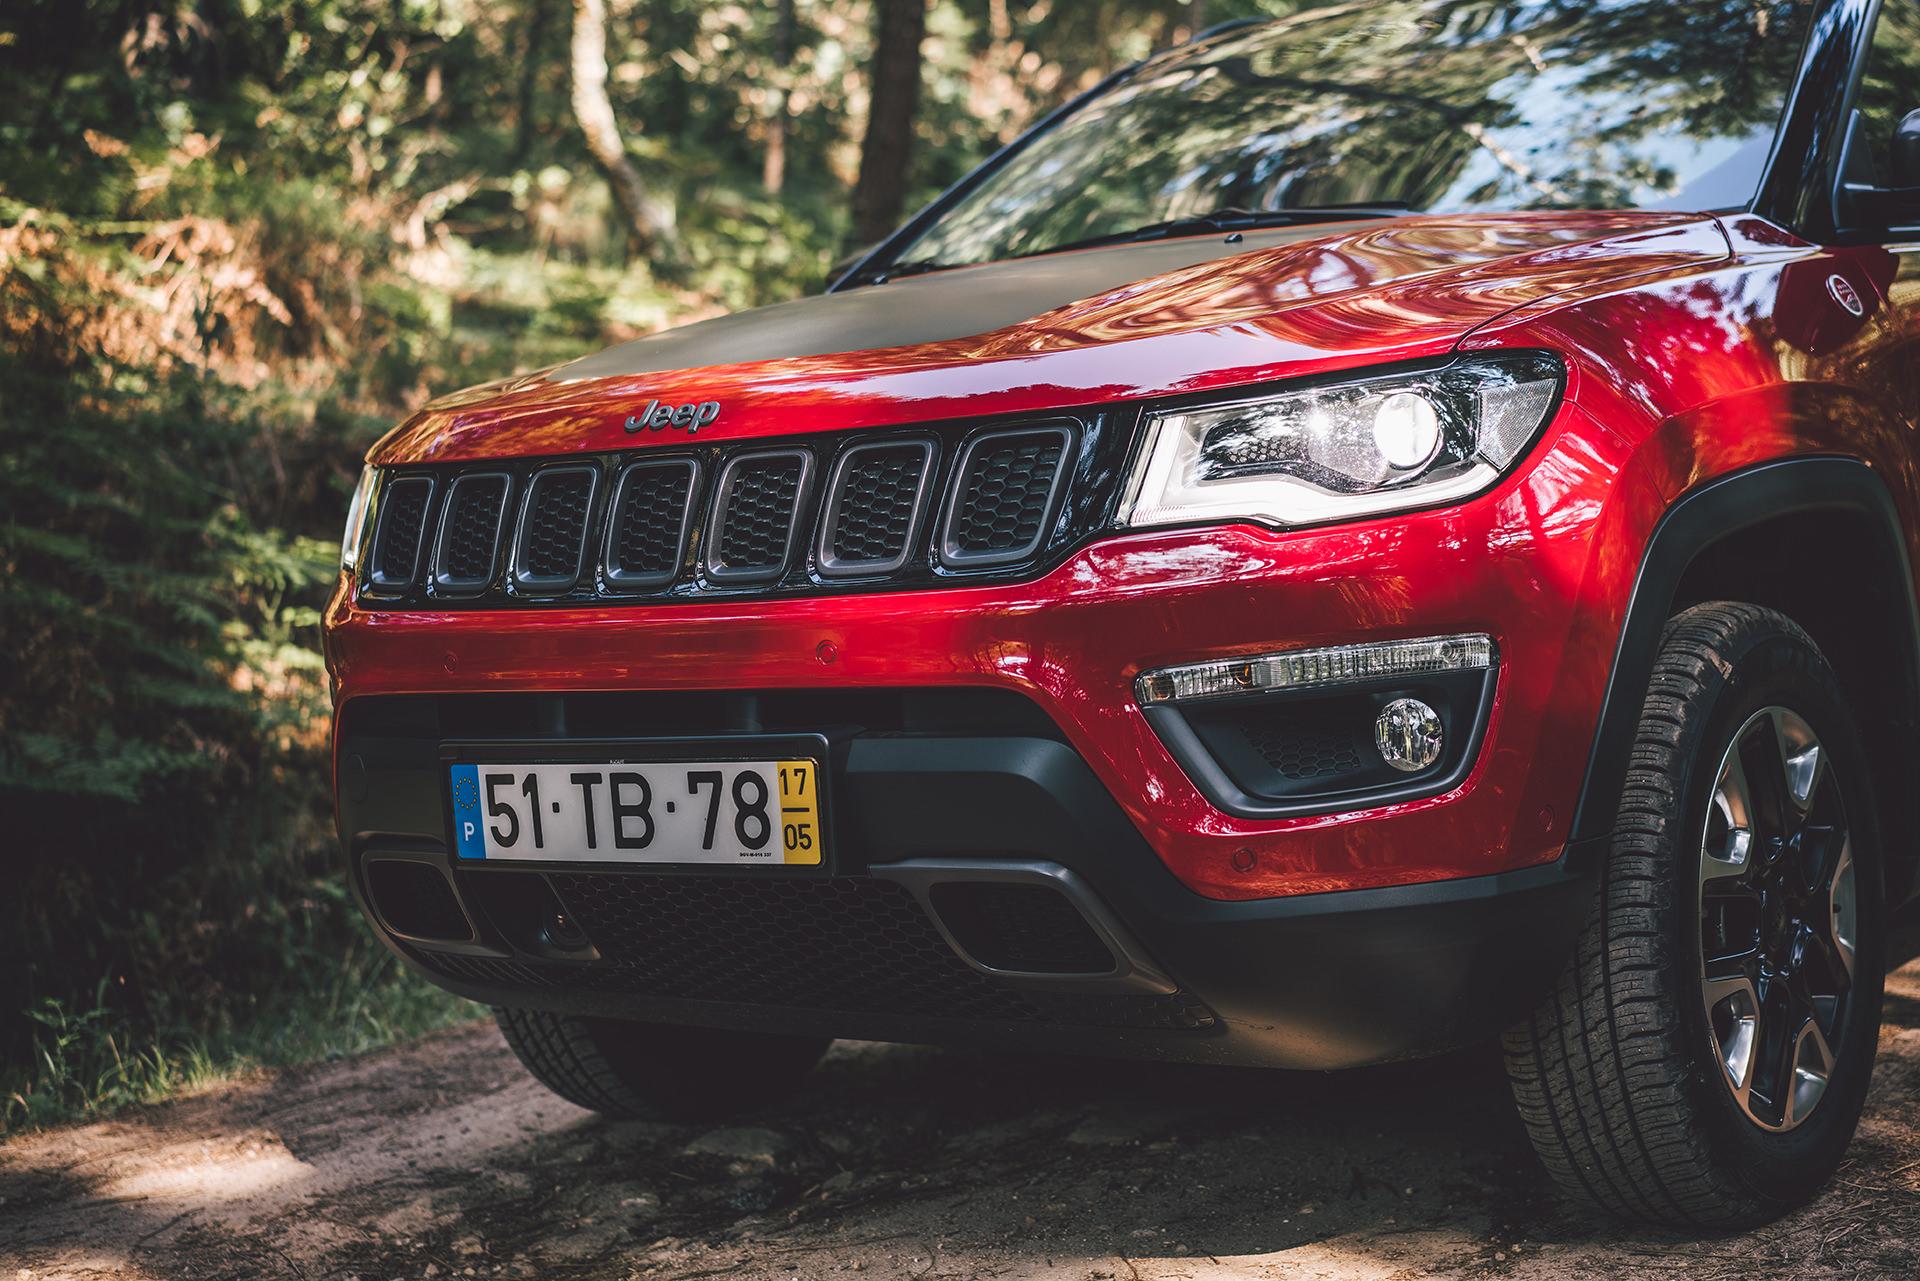 auto-jeep-detailshot-sonne-schatten